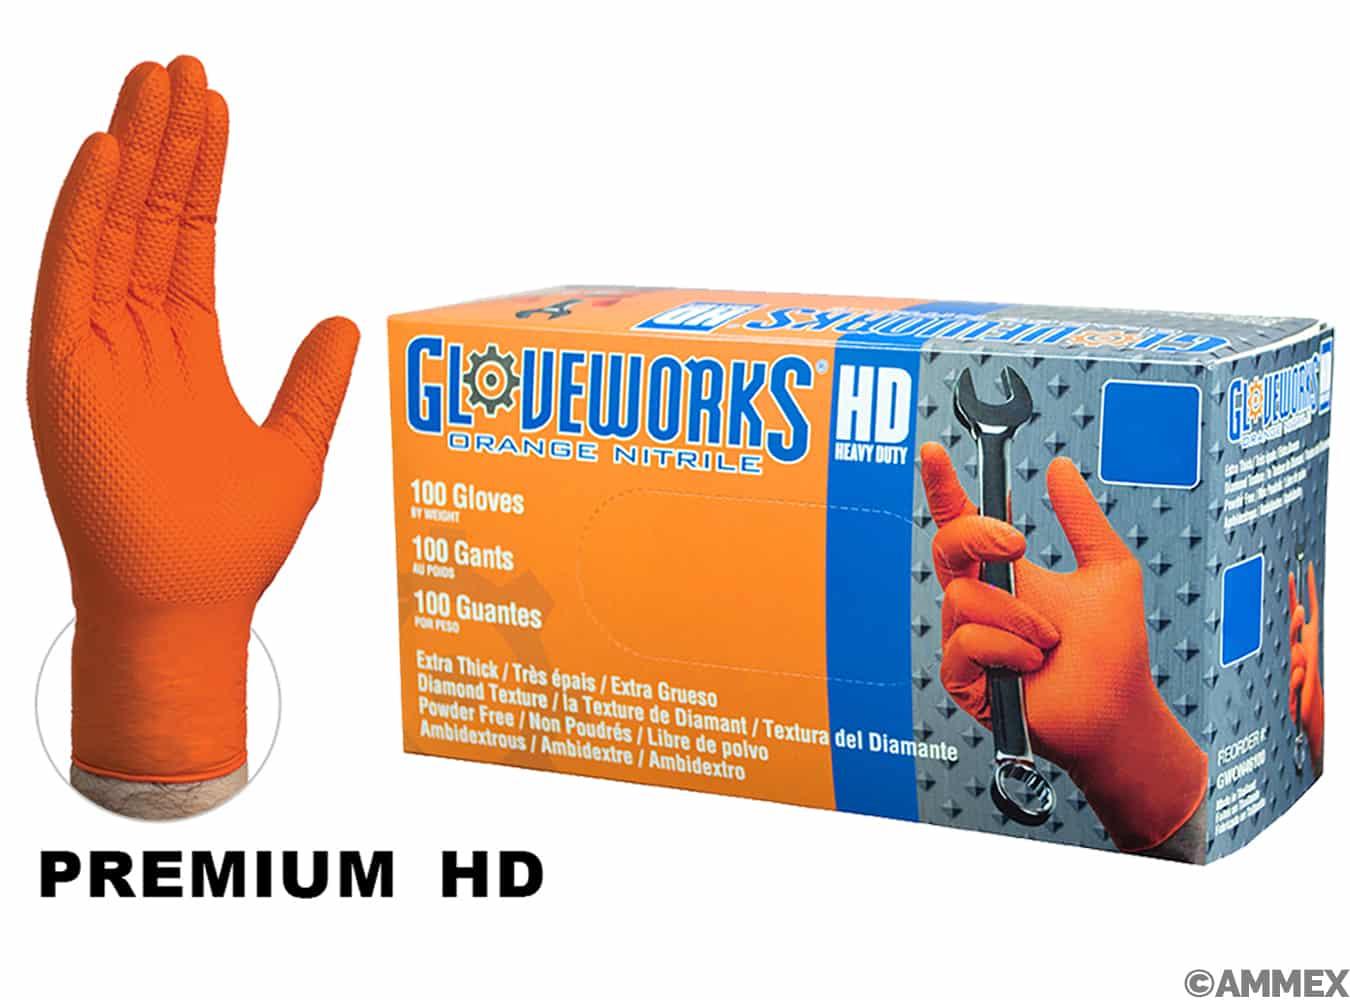 Orange Nitrile PF Industrial Gloves, diamond grip